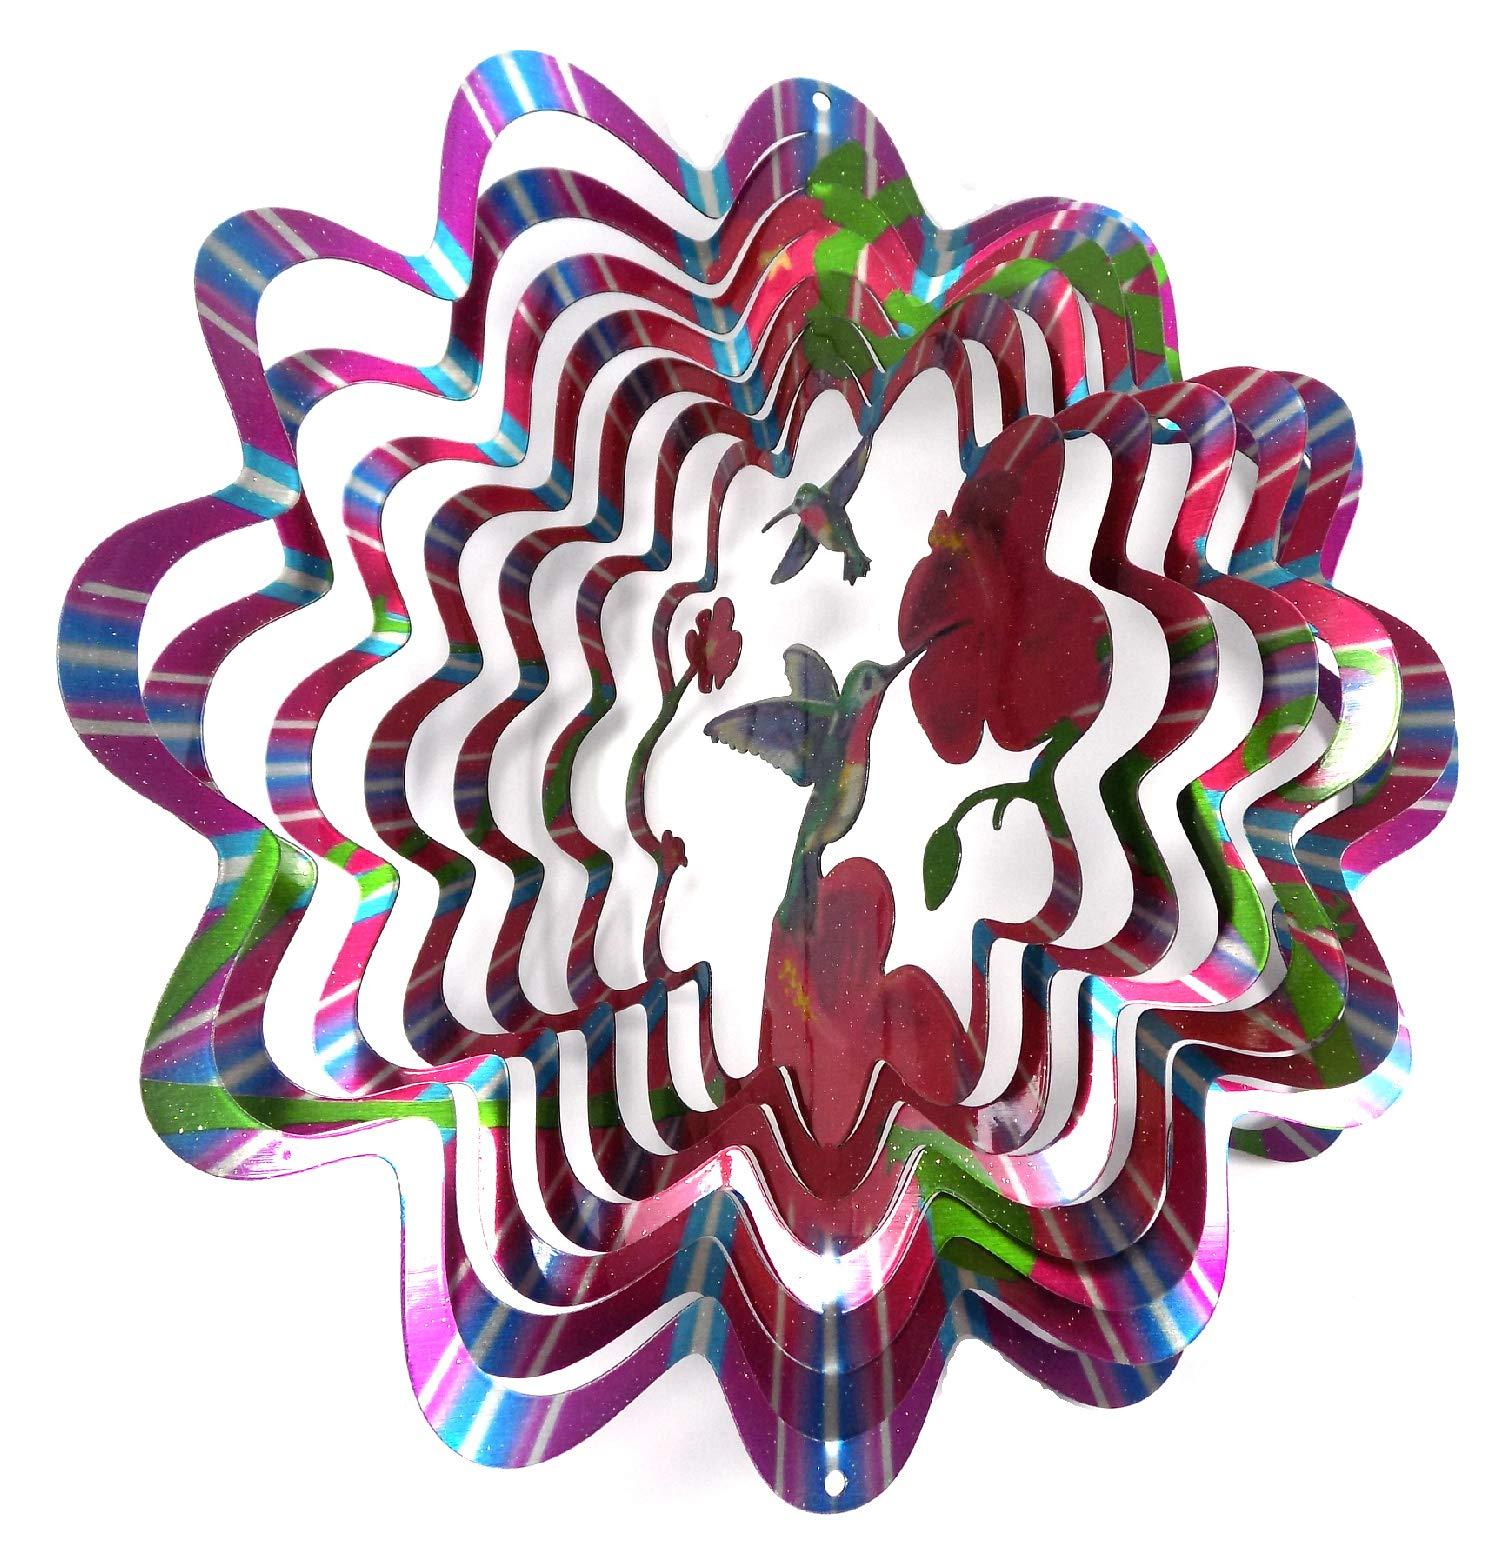 WorldaWhirl Whirligig 3D Wind Spinner Hand Painted Stainless Steel Twister Hummingbird (6.5'' Inch, Multi Color Rainbow)